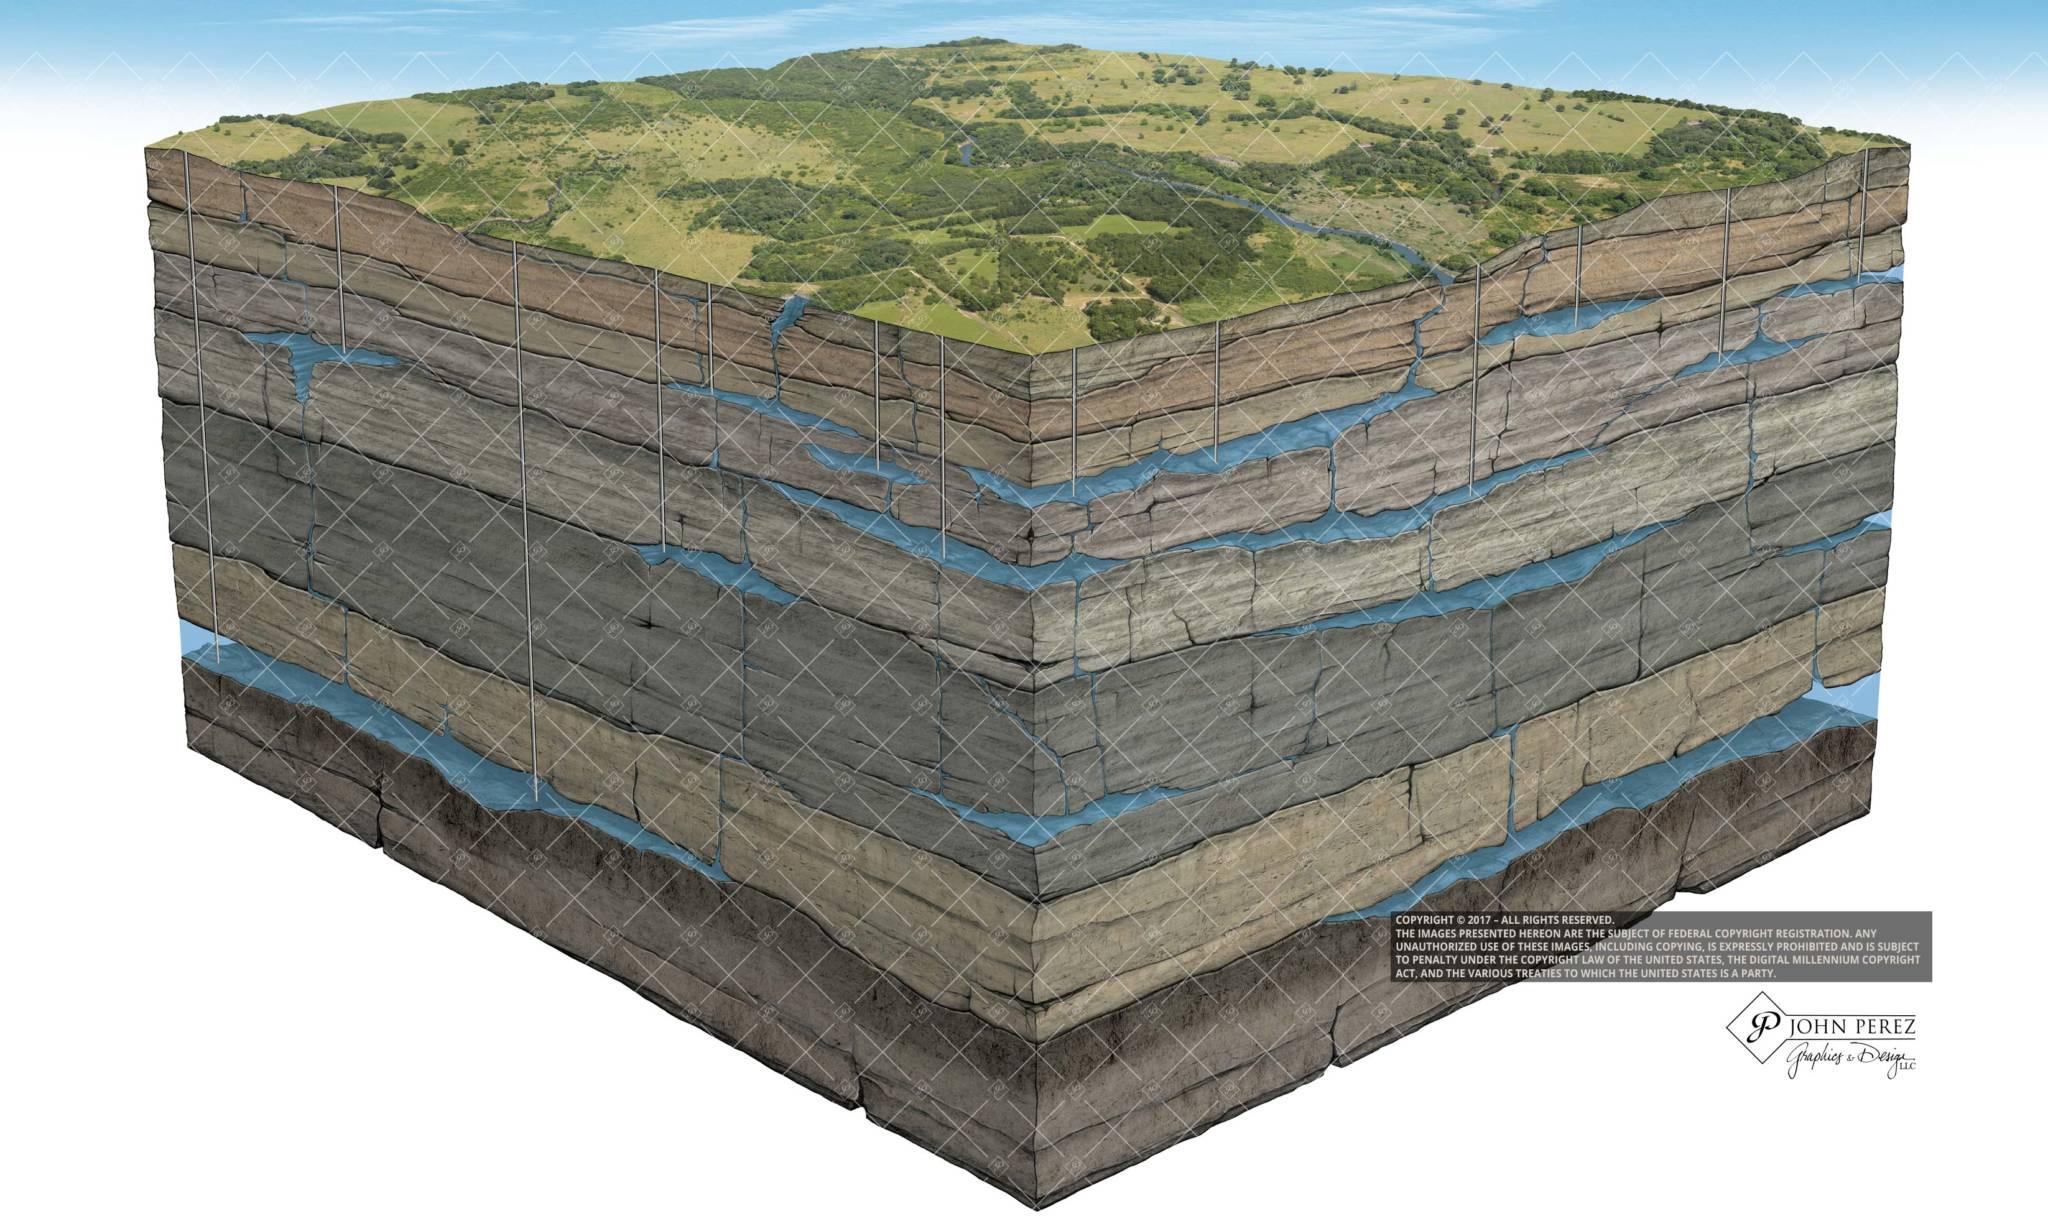 Aquifer Schematic Illustration, john perez graphics, drilling geology, aquifer, drilling water, schematic illustration